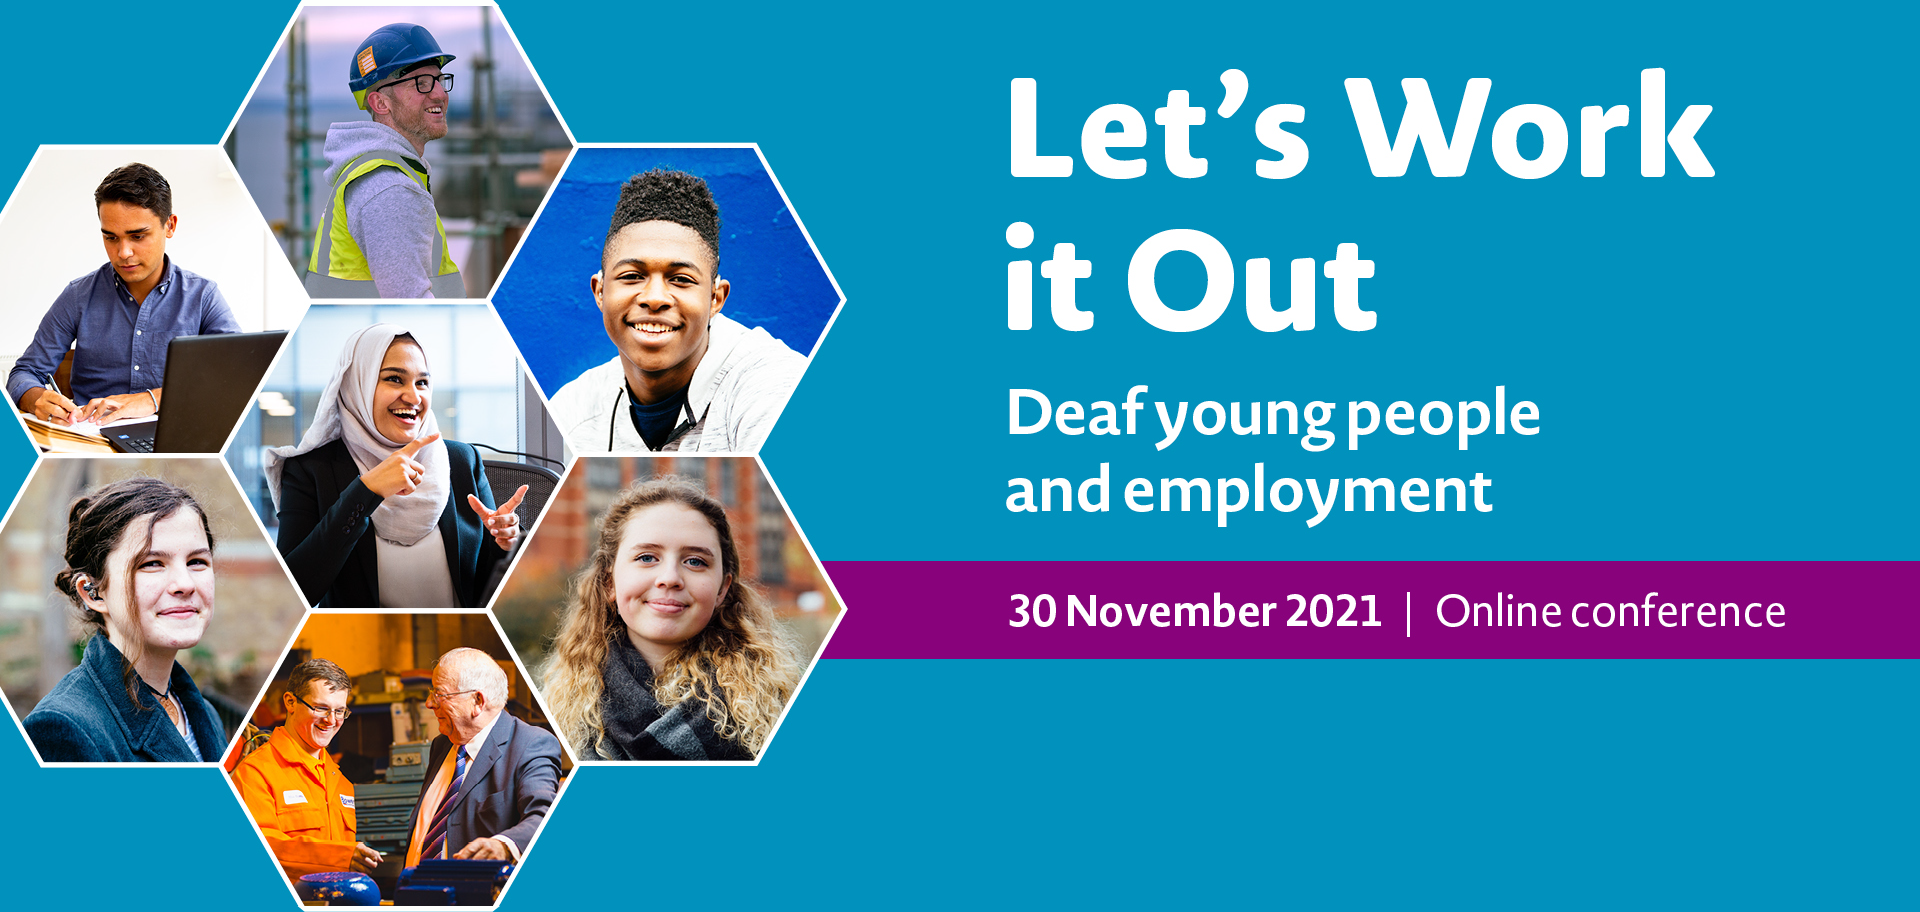 Let's Work it Out 30 November 2021   Online conference